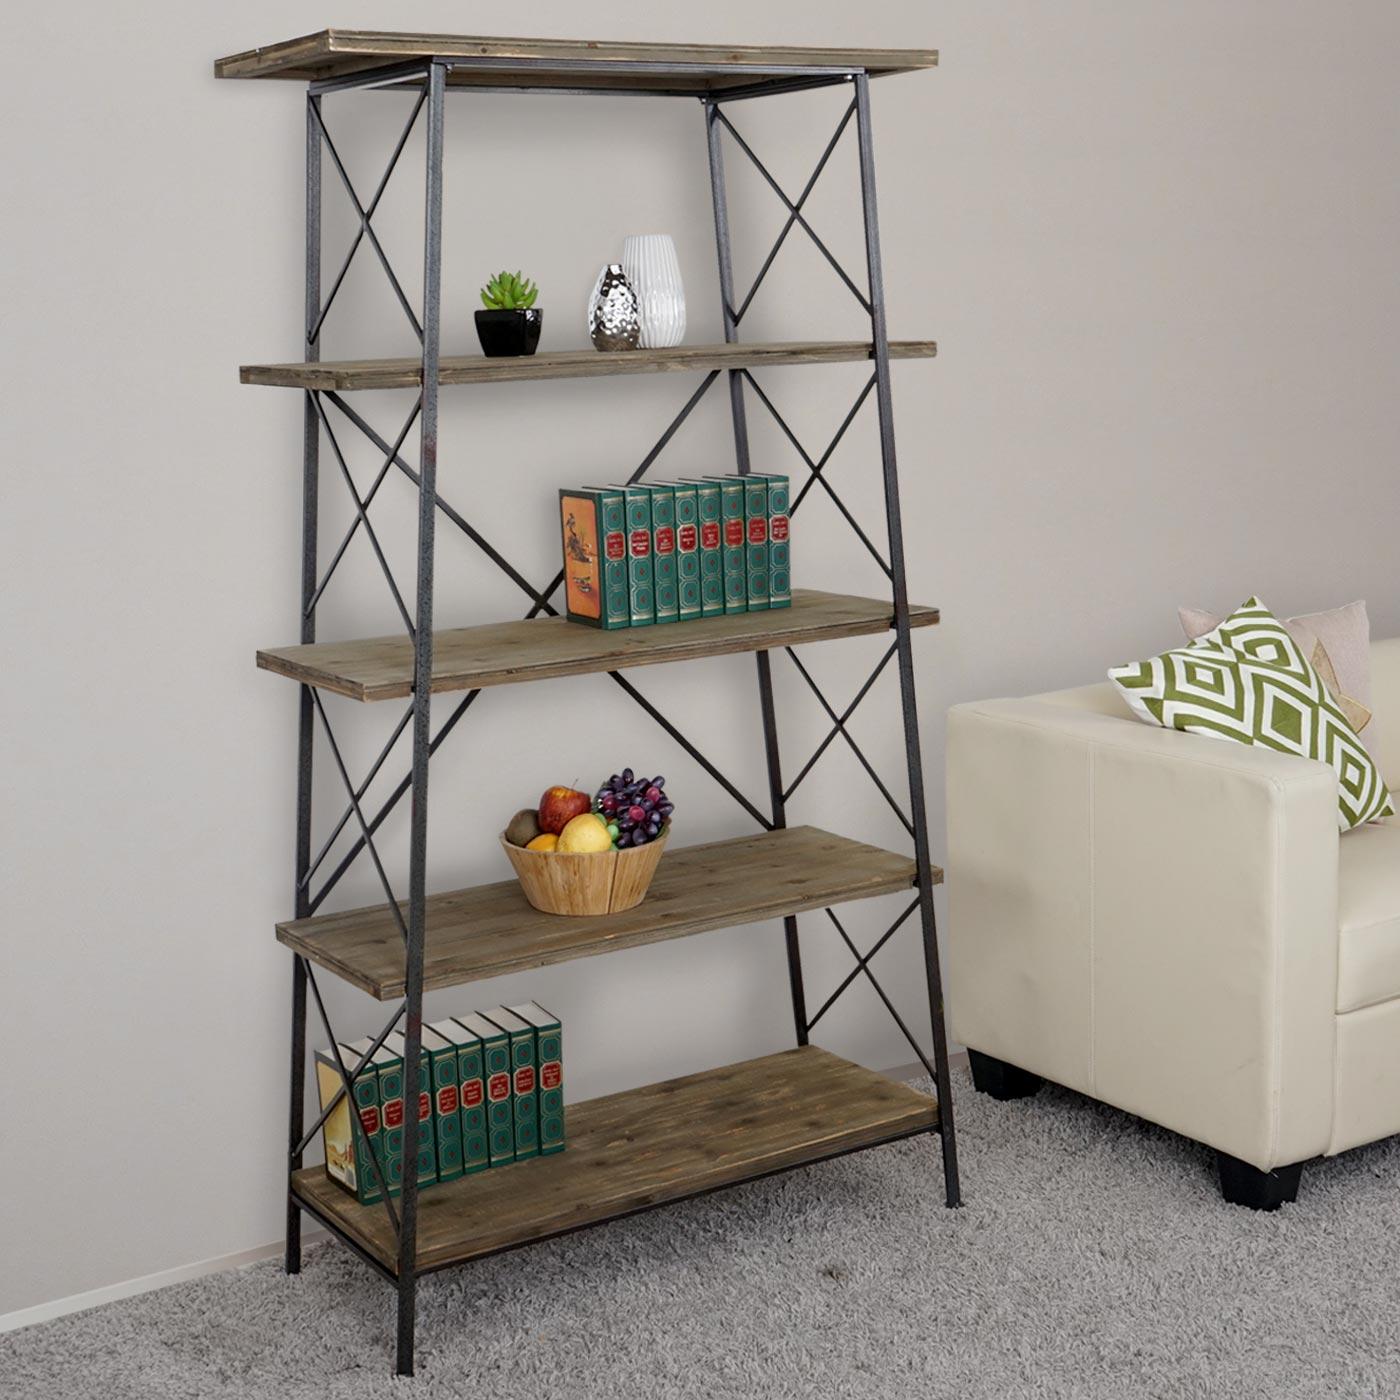 b cherregal hwc echtholz metall 5 ebenen 172x92cm. Black Bedroom Furniture Sets. Home Design Ideas